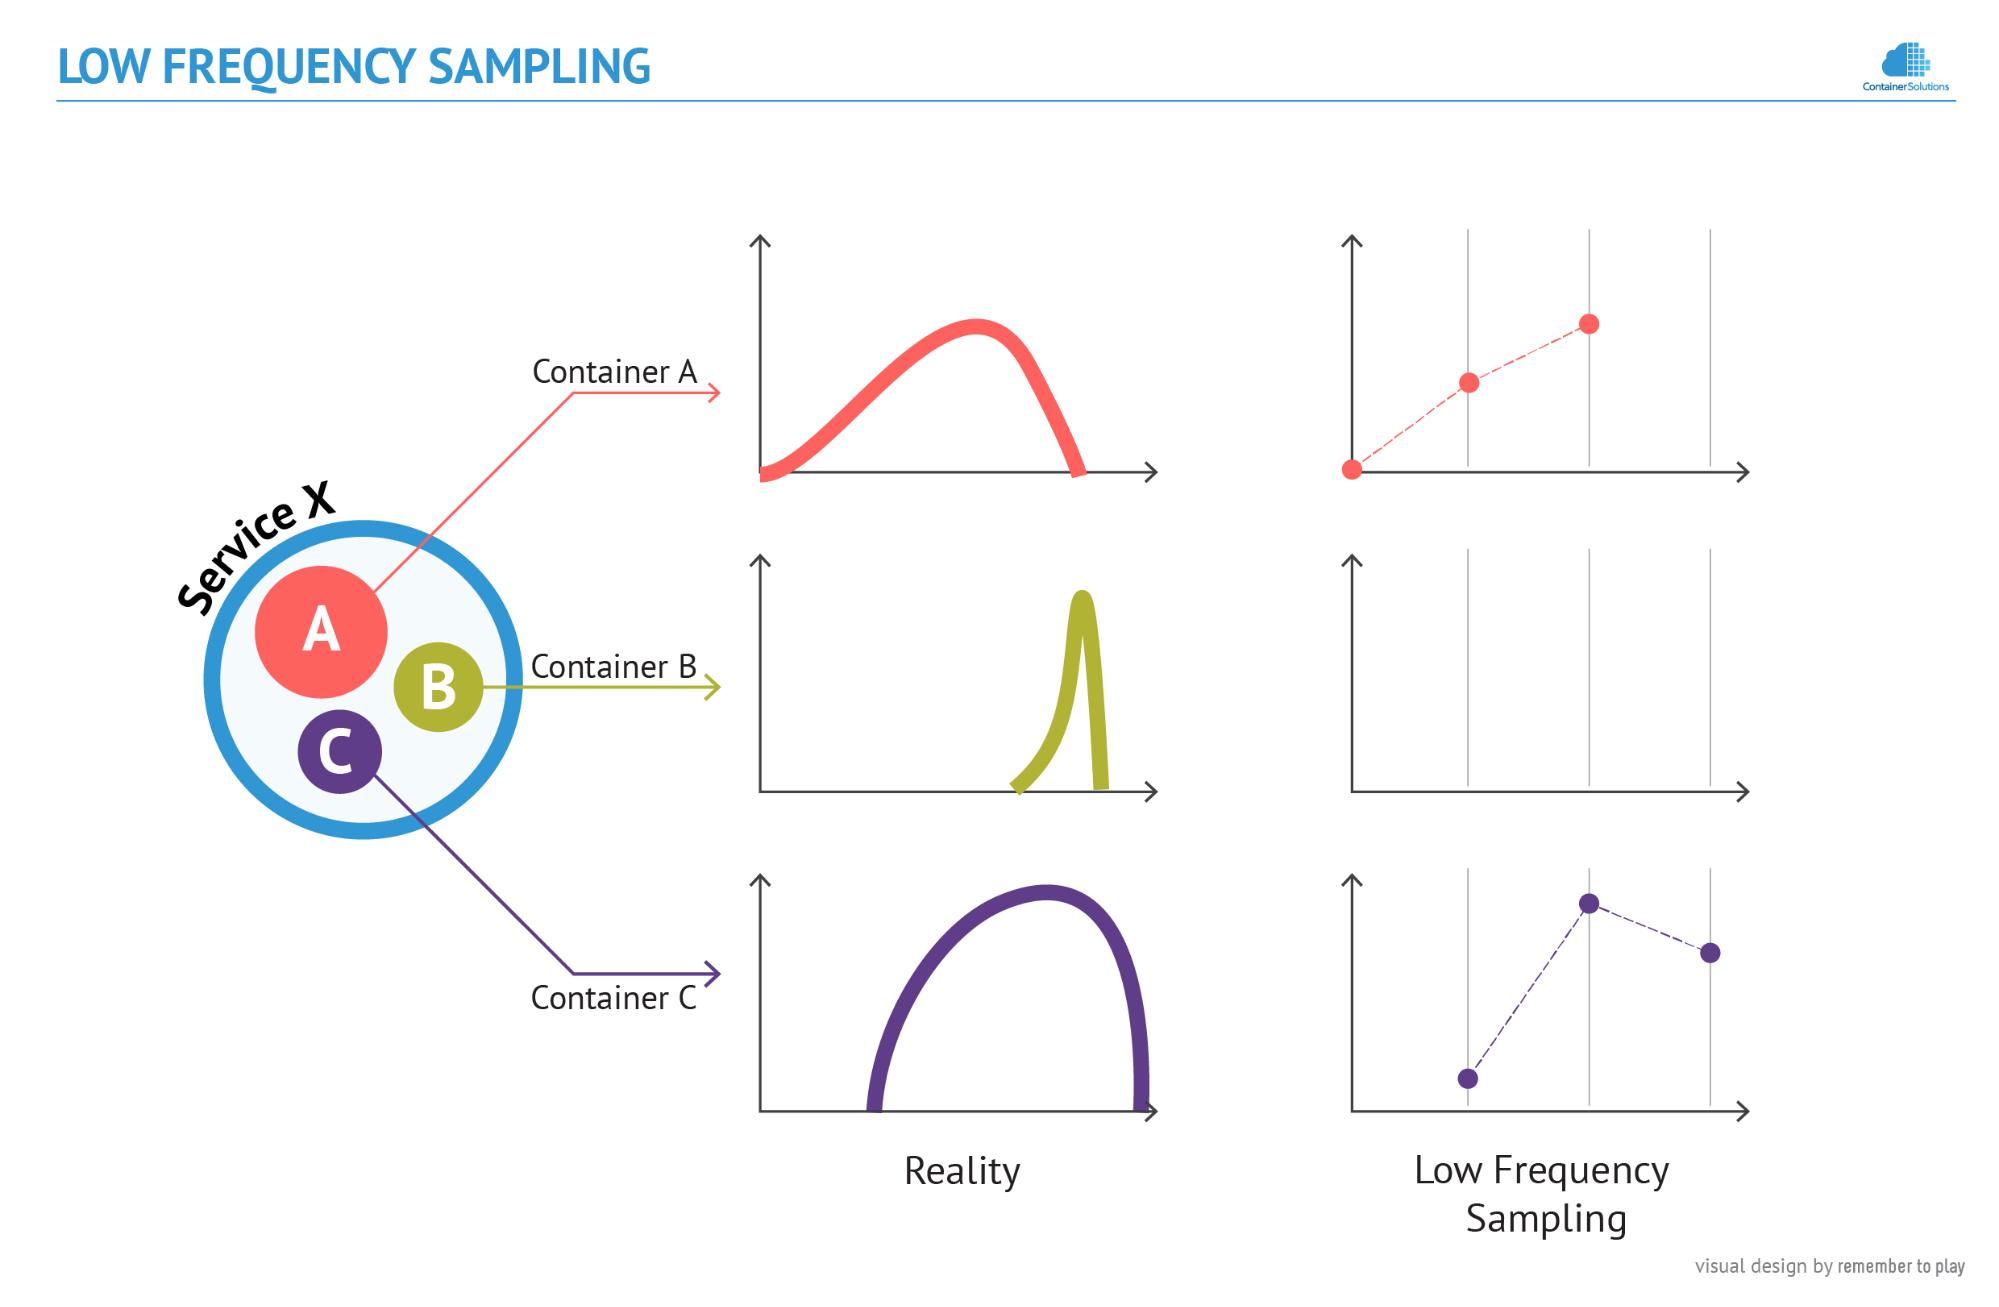 Low Frequency Sampling diagram